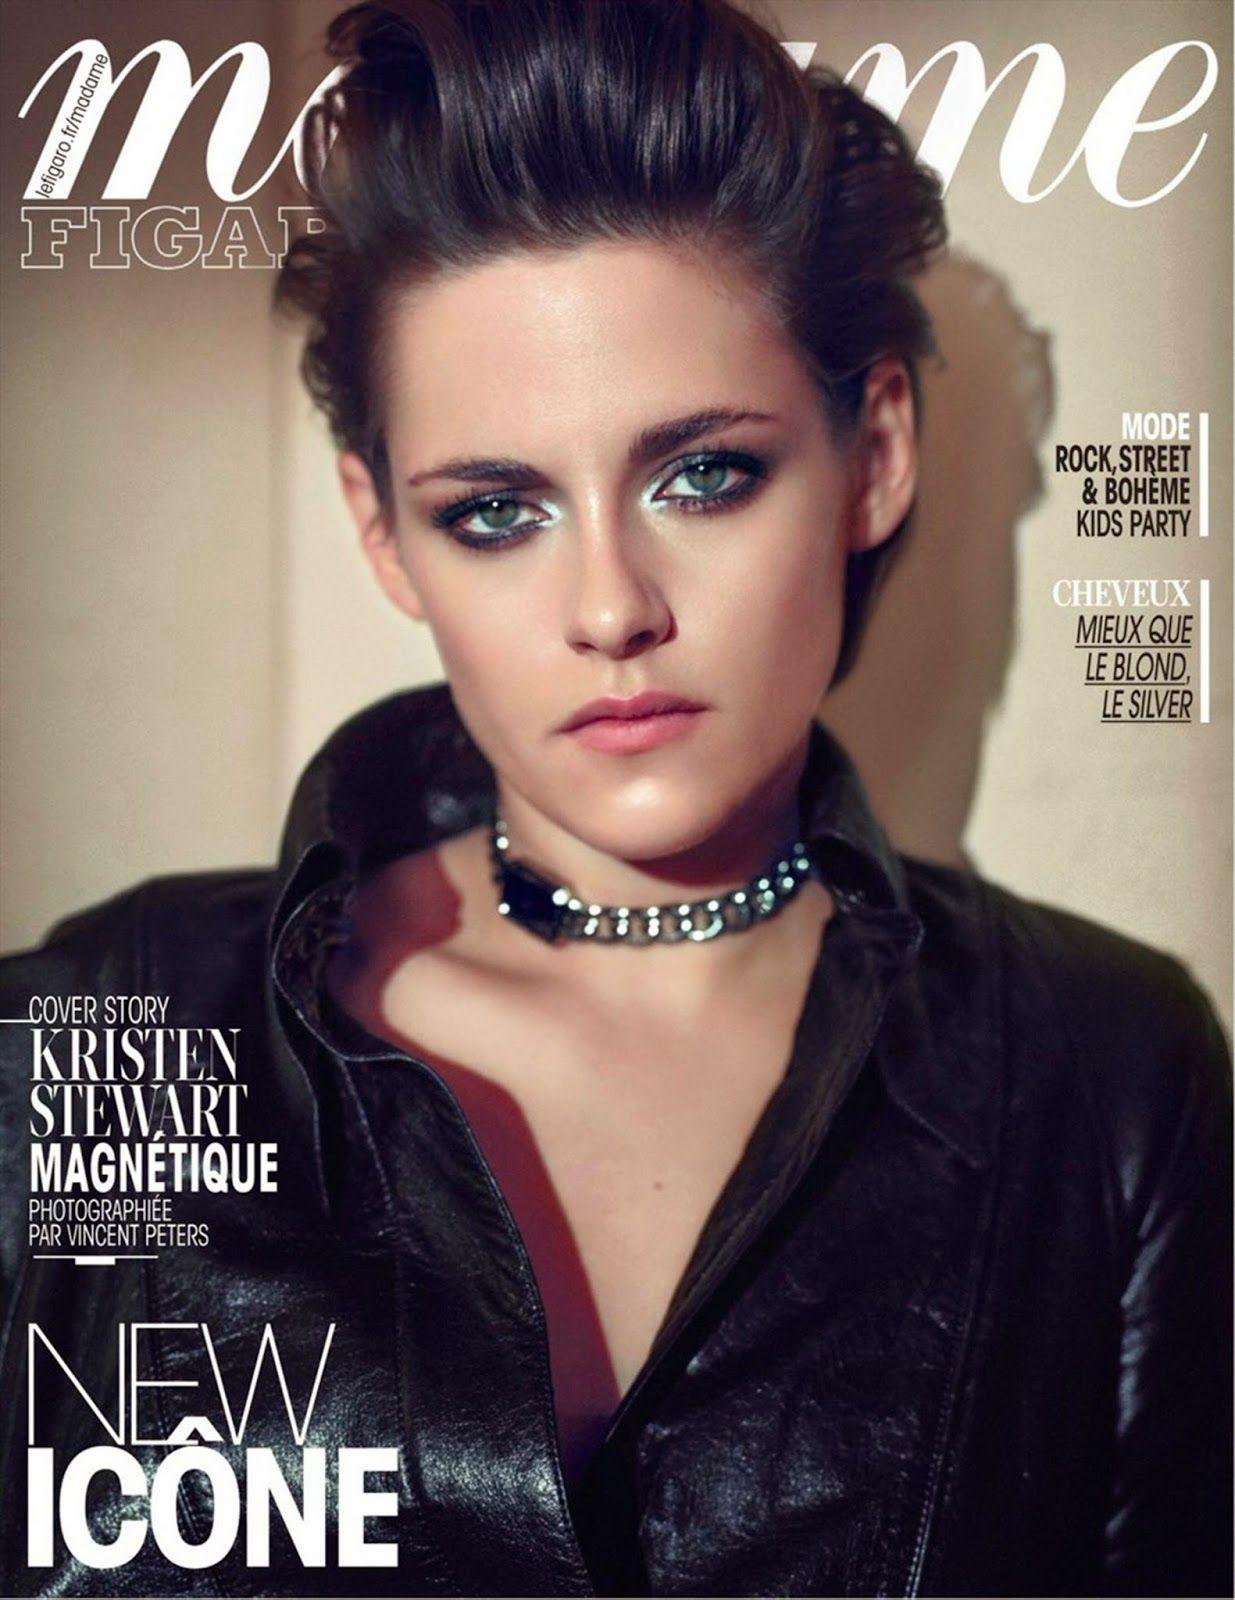 Duchess Dior: Kristen Stewart in Chanel by Peter Vincent for Madame Figaro